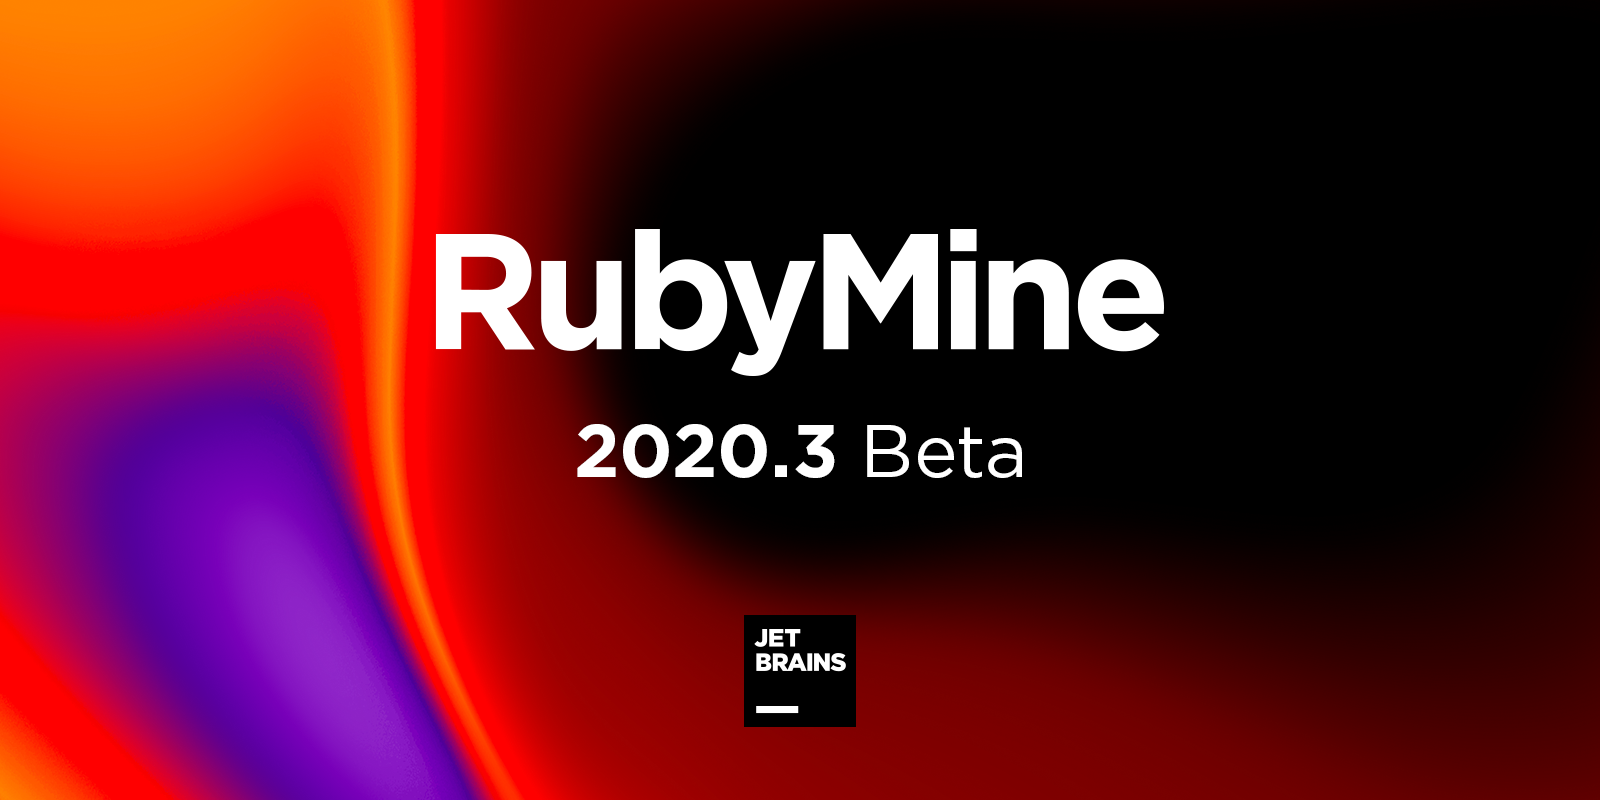 RubyMine 2020.3 Beta 2